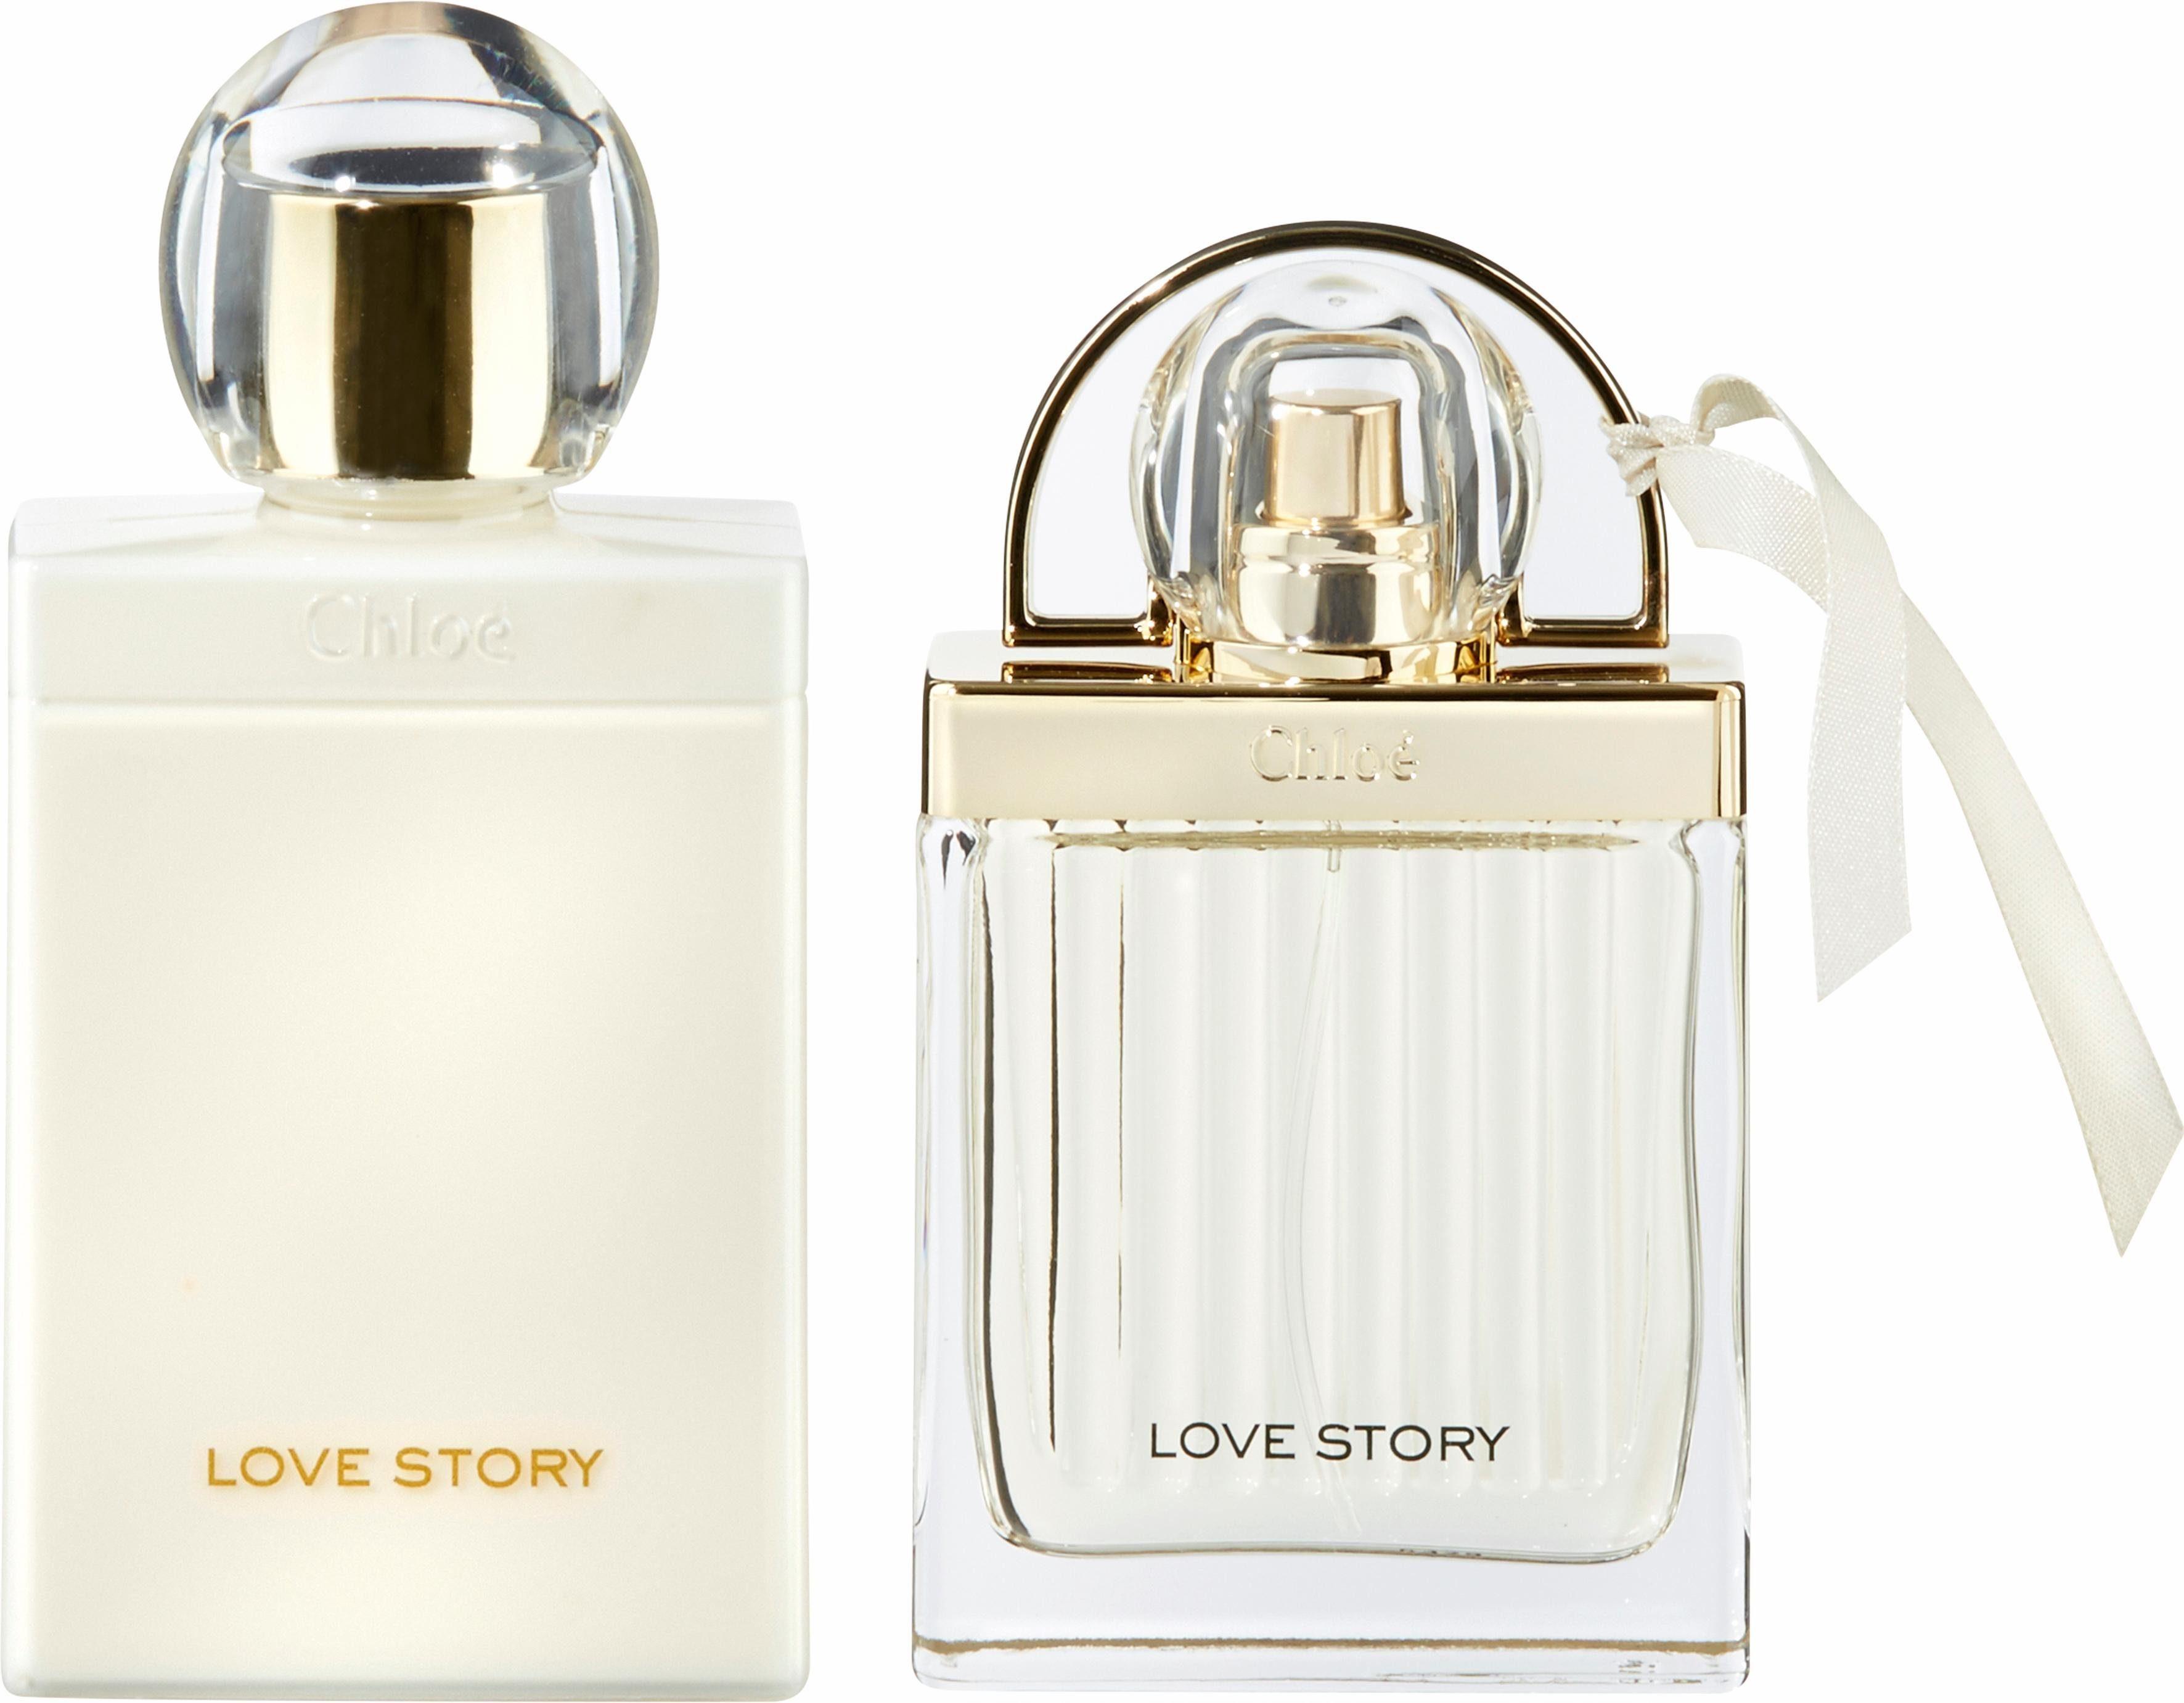 Chloé Duft-Set »Love Story«, 2-tlg.